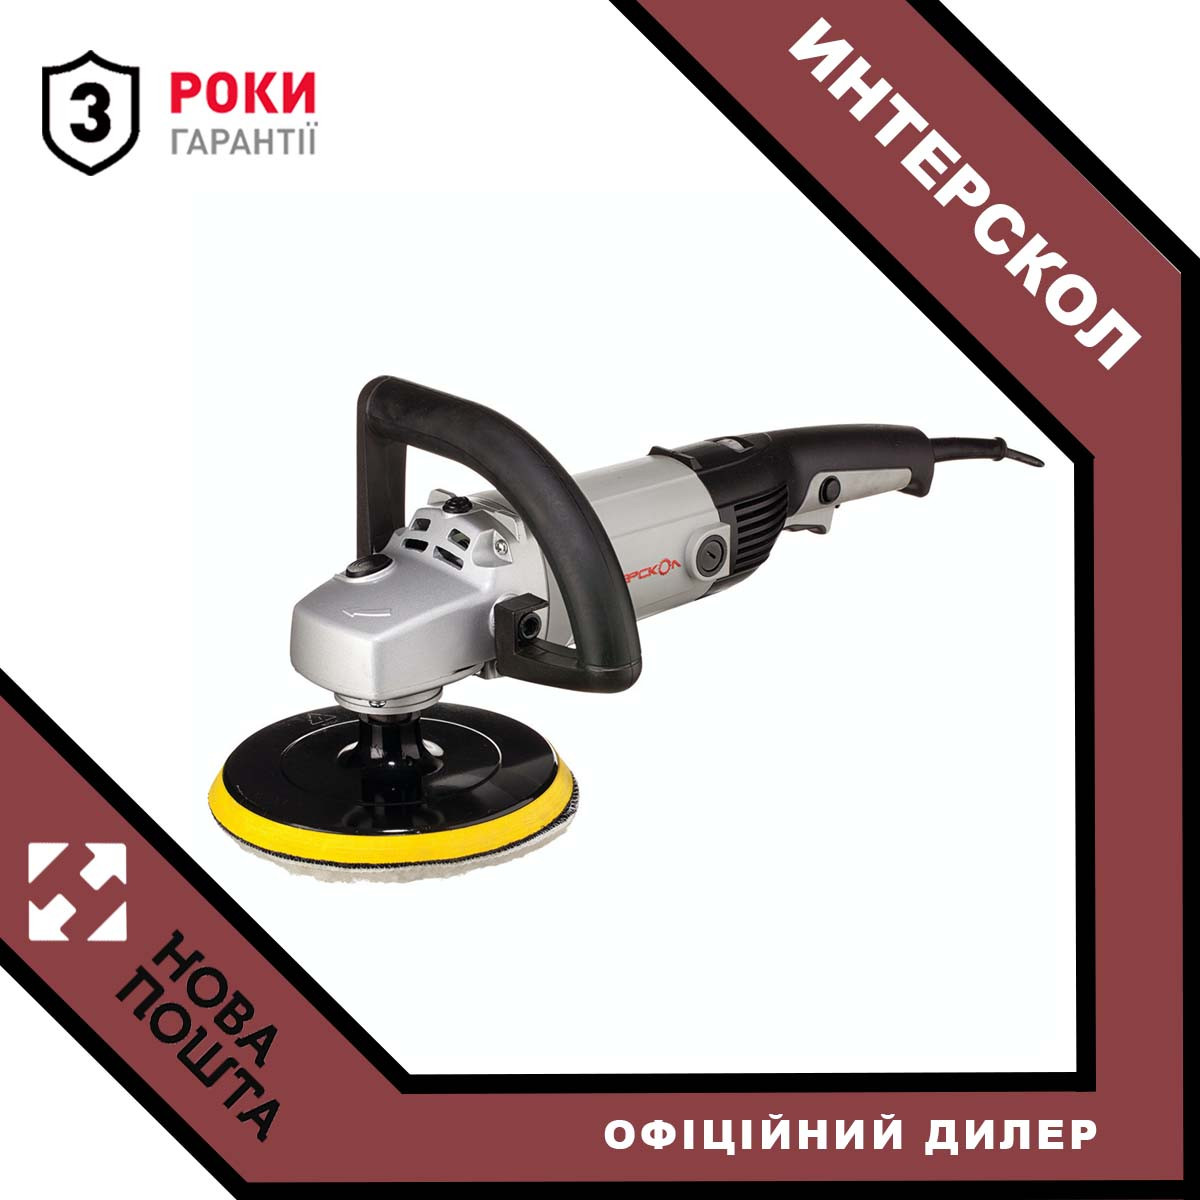 Полірувальна машина Интерскол УПМ-180/1300 ЕМ